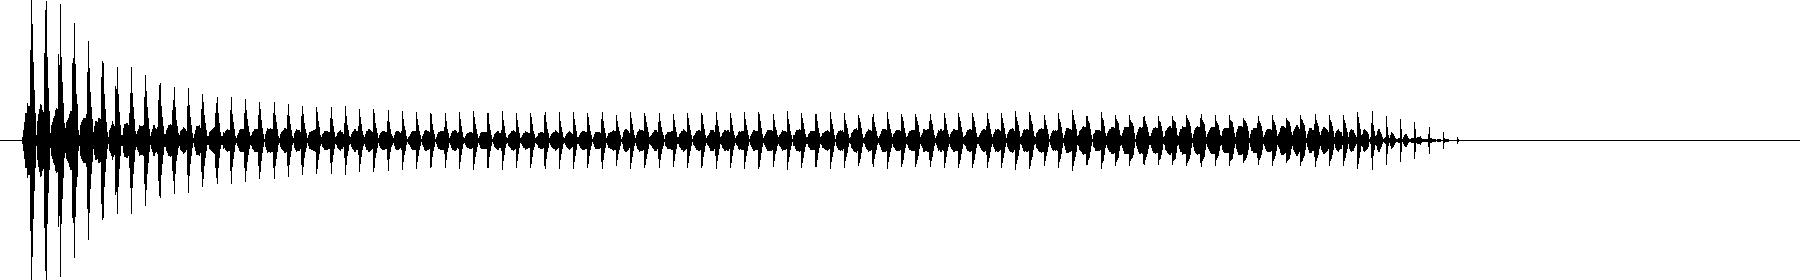 perc 1 20